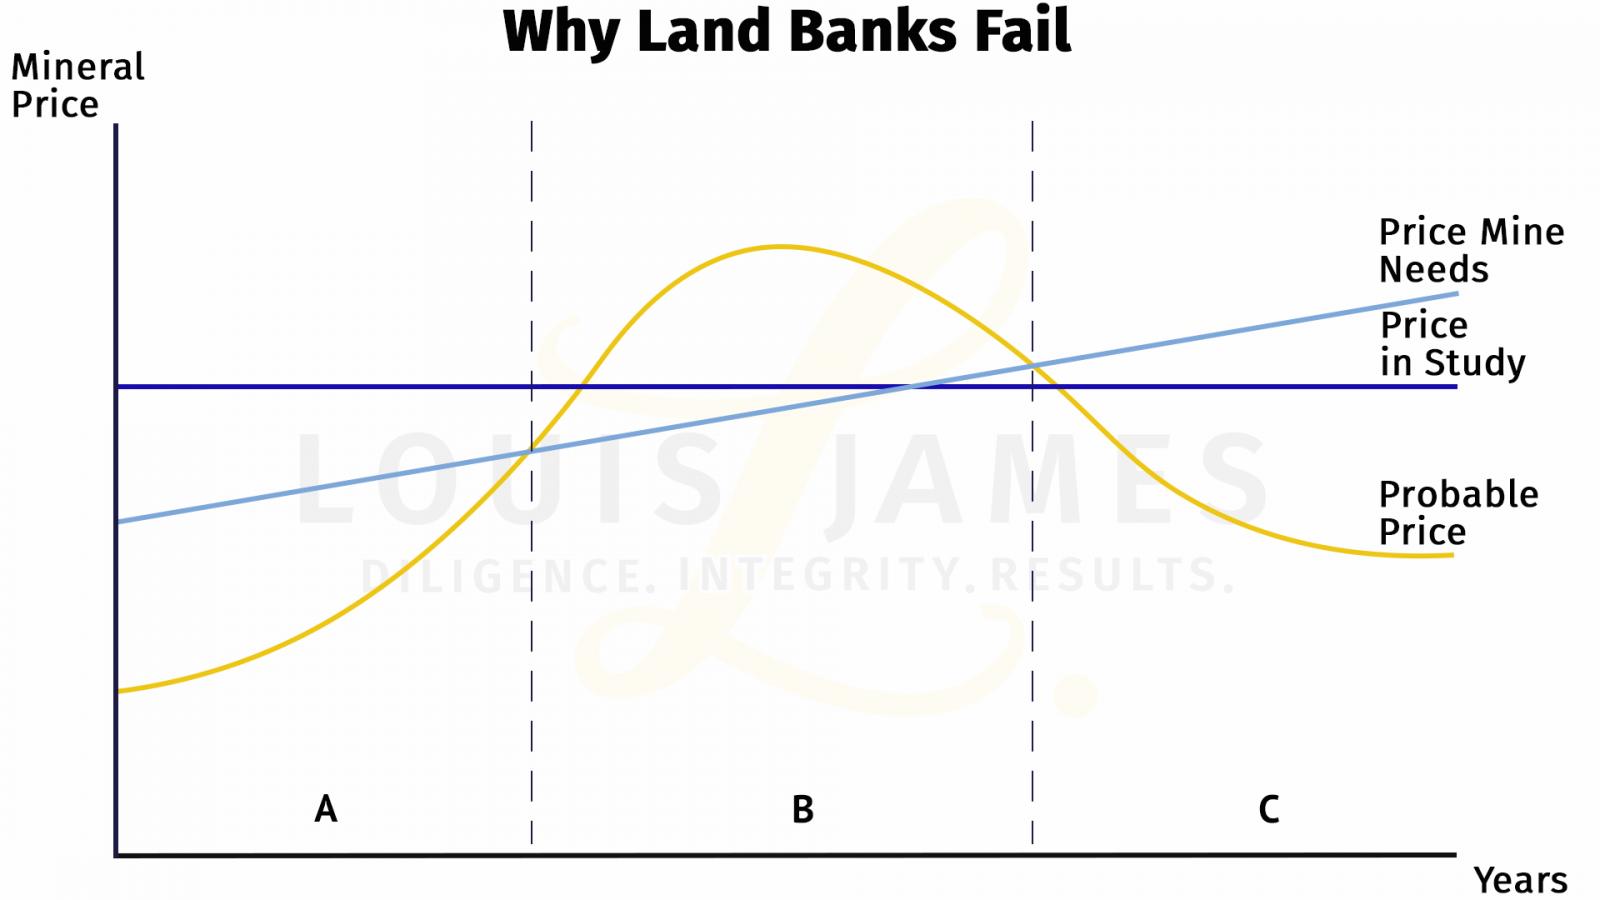 Why Land Banks Fail